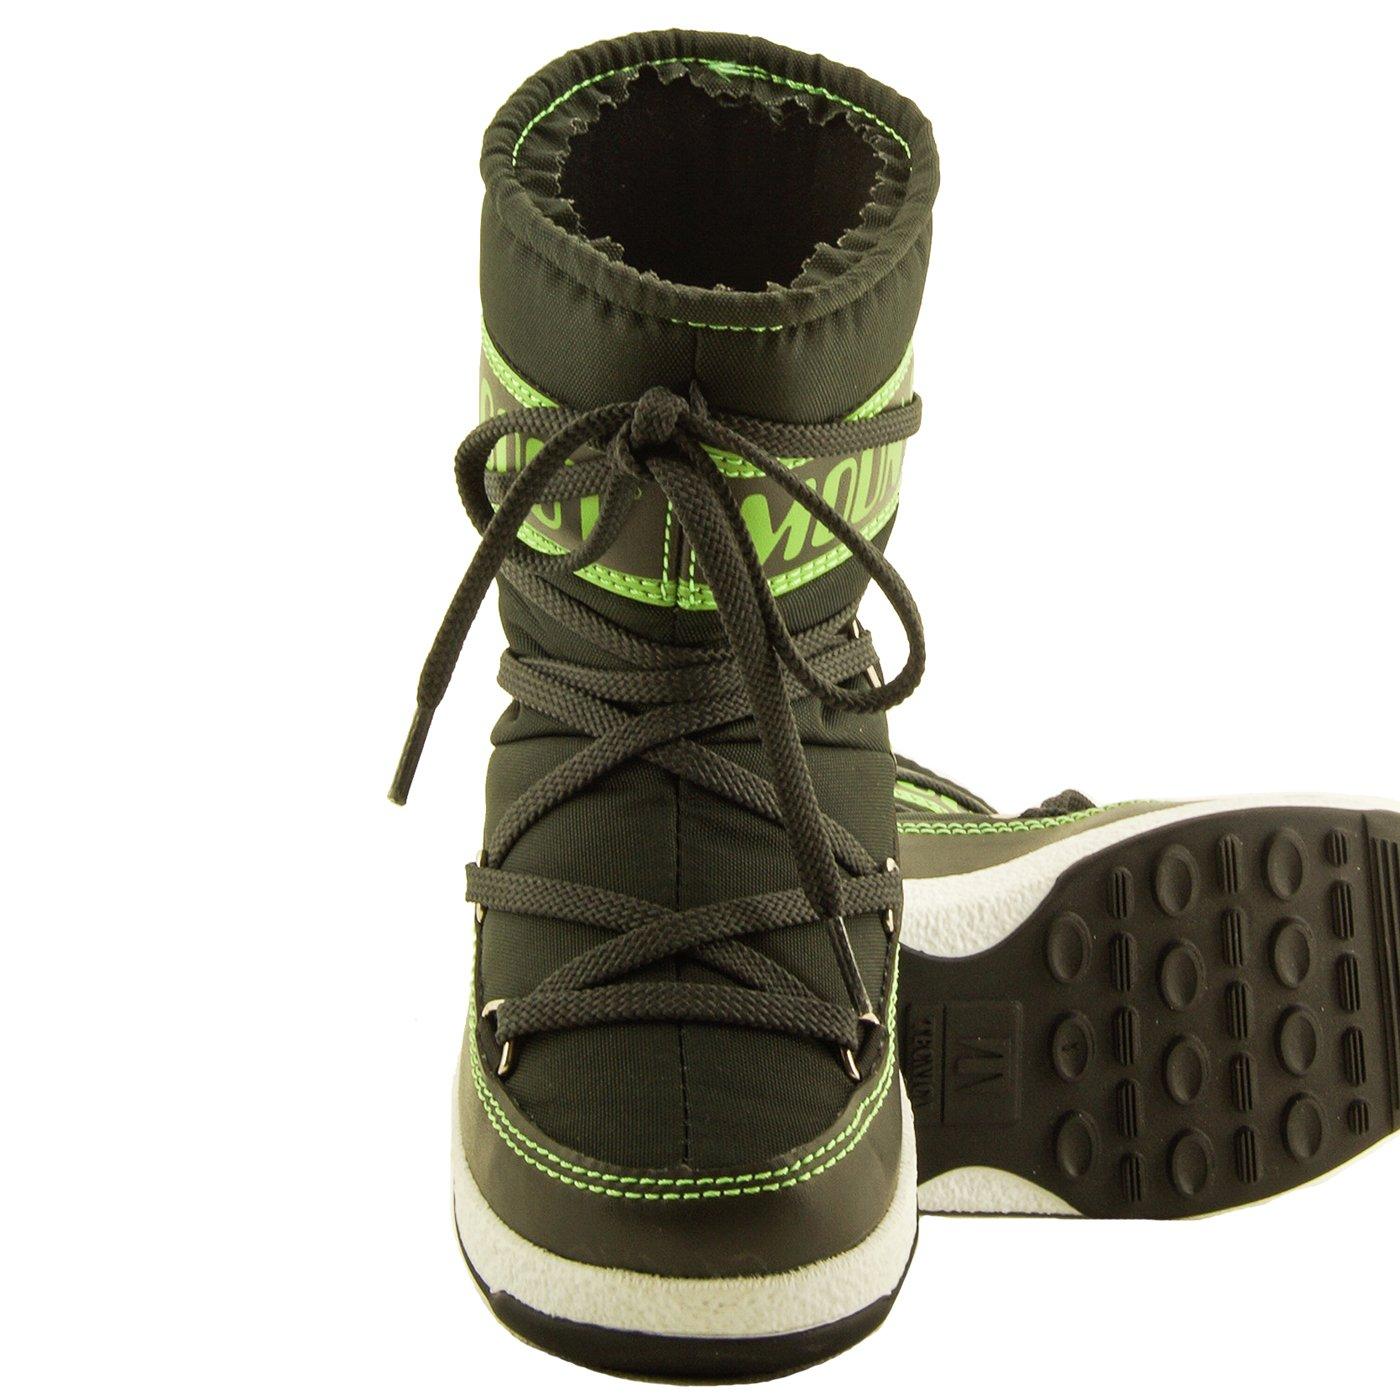 Moon Stiefel Stiefel Stiefel W.E. Sport Mid JR Kinder Stiefel e1c0d3